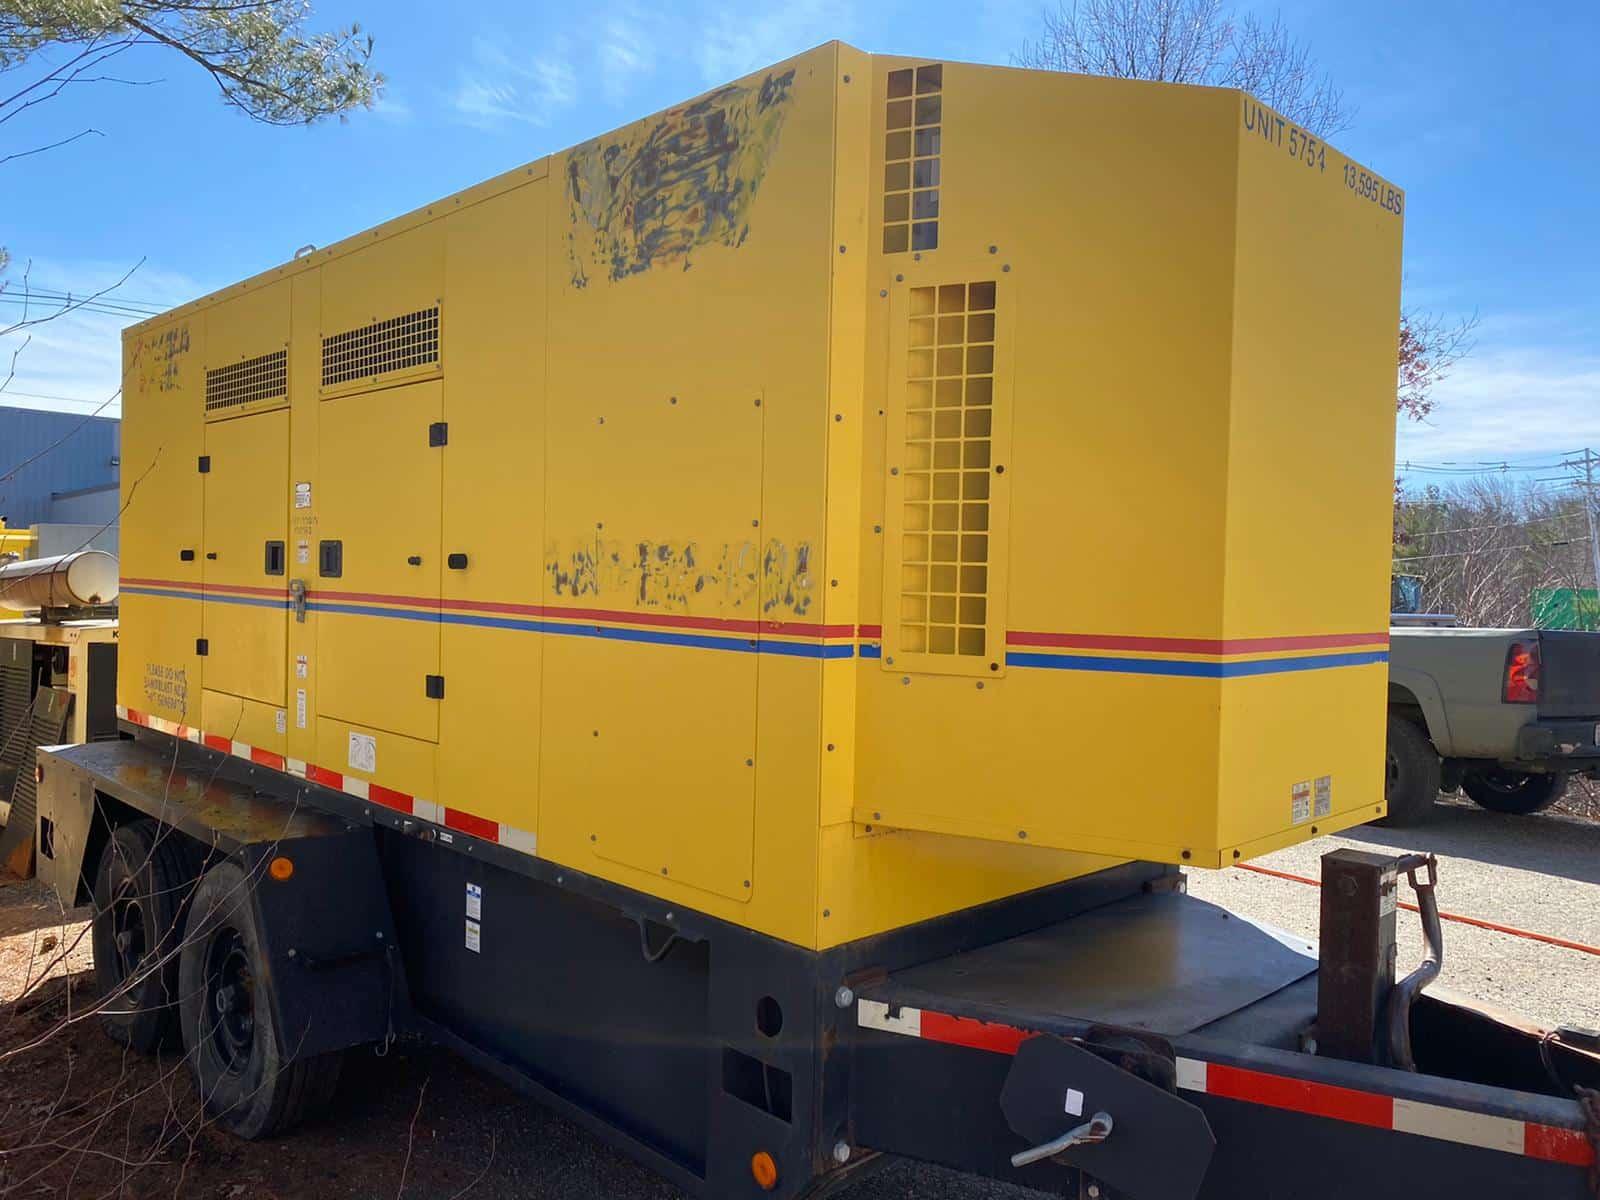 Used 260 kW Doosan G325WCU-3A-T4I Portable Diesel Generator – EPA Tier 4 Interim – ON RENT